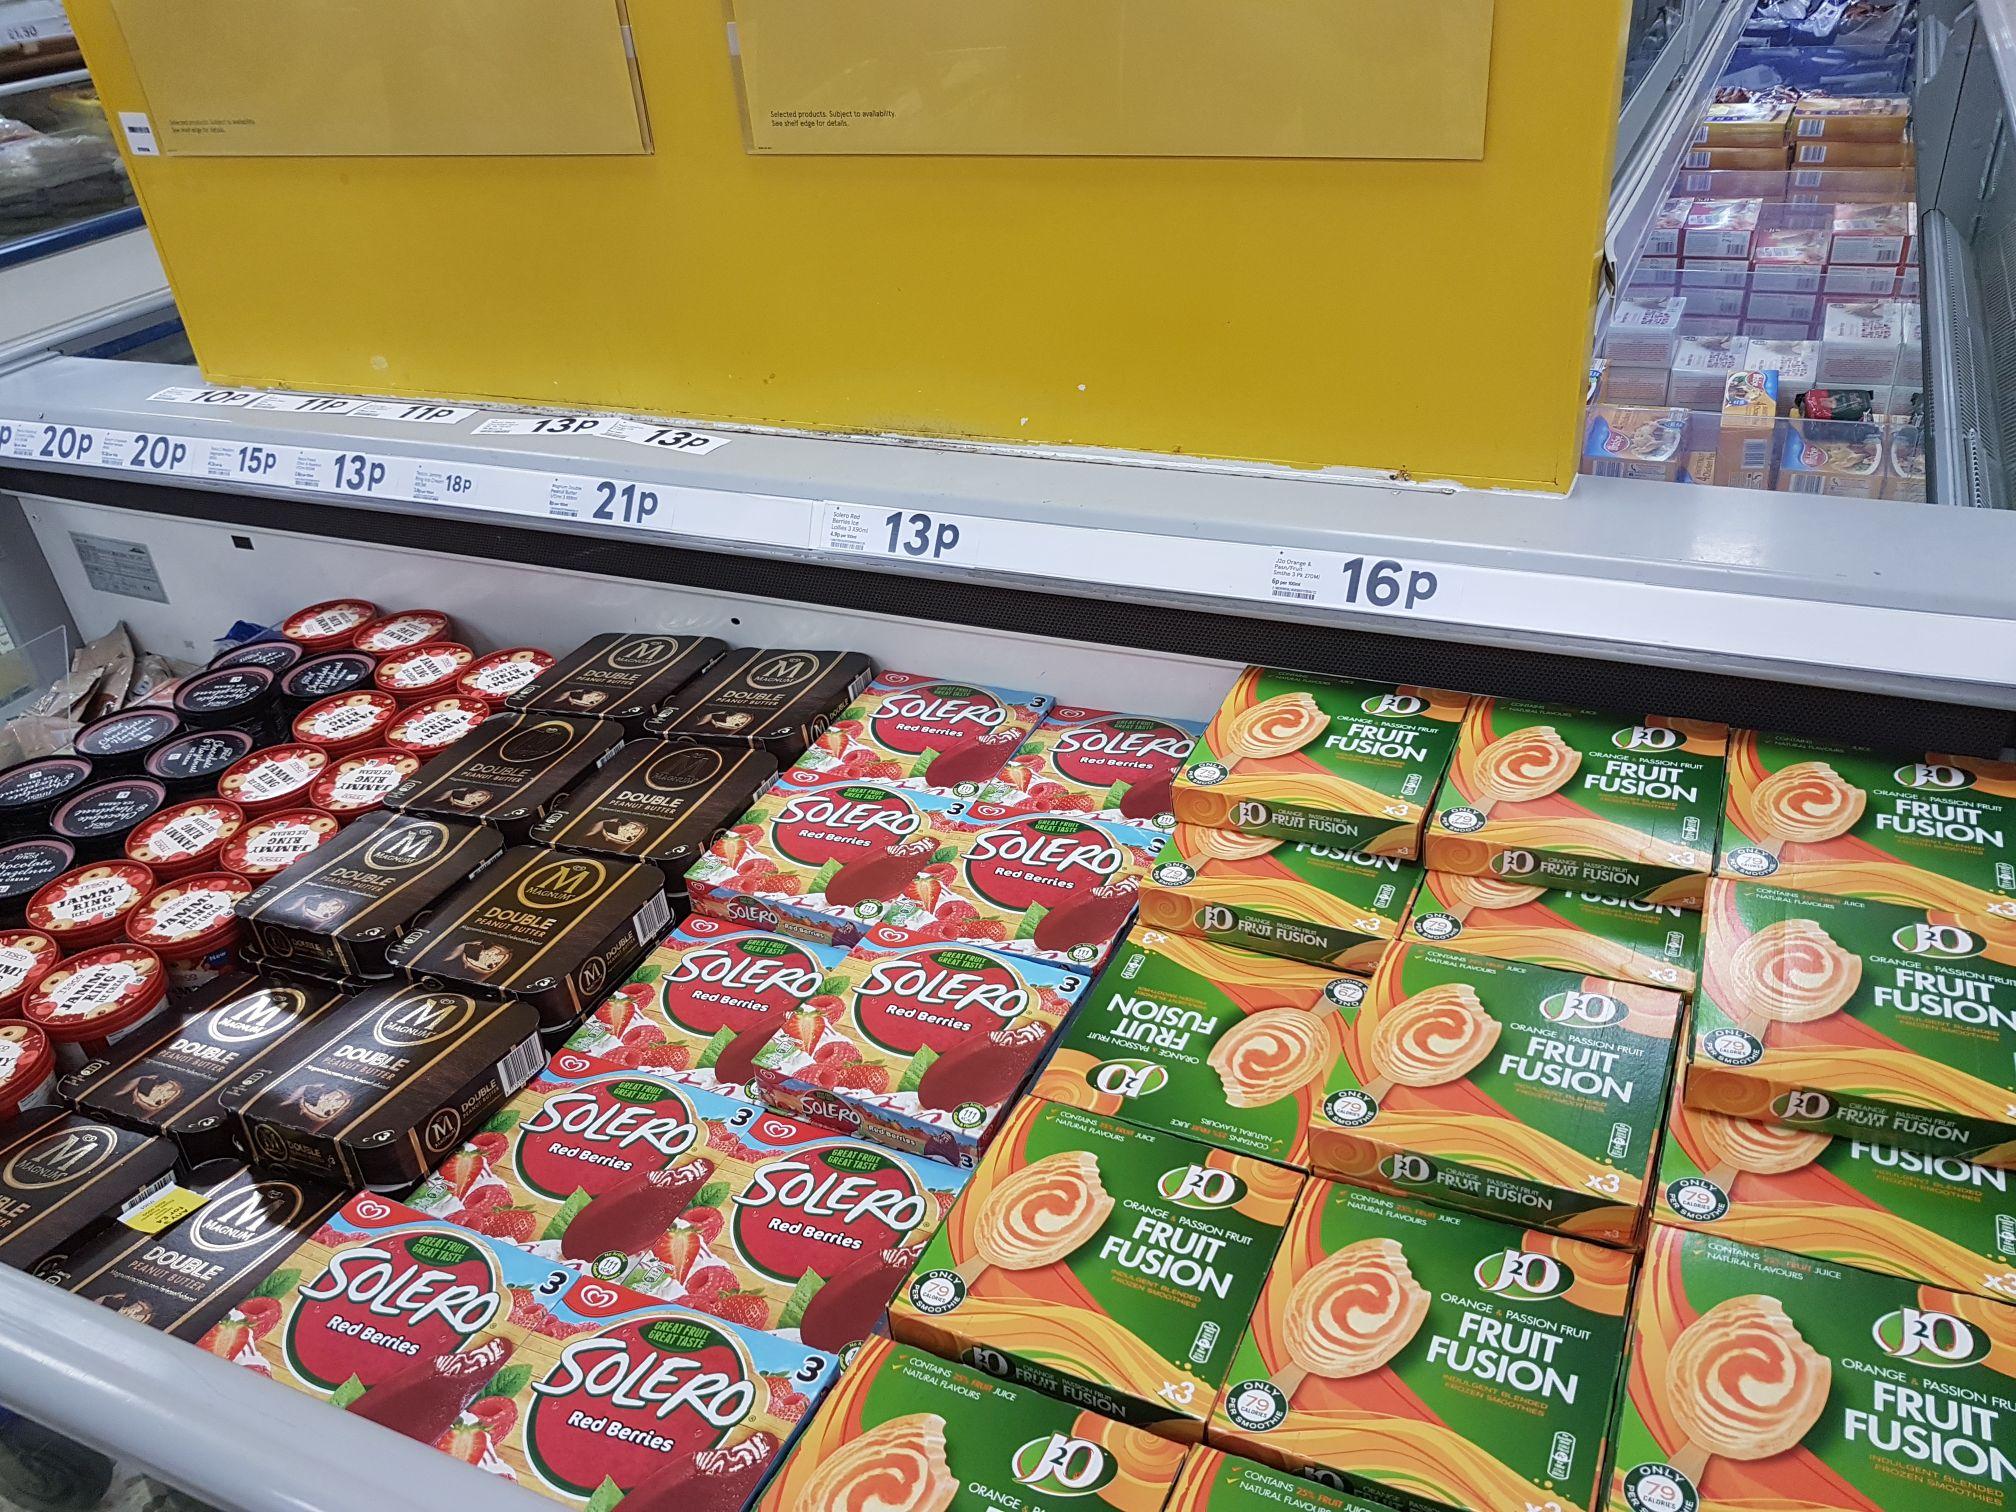 Solero red berries ice lollys 3pack 13p at Tesco Blackpool